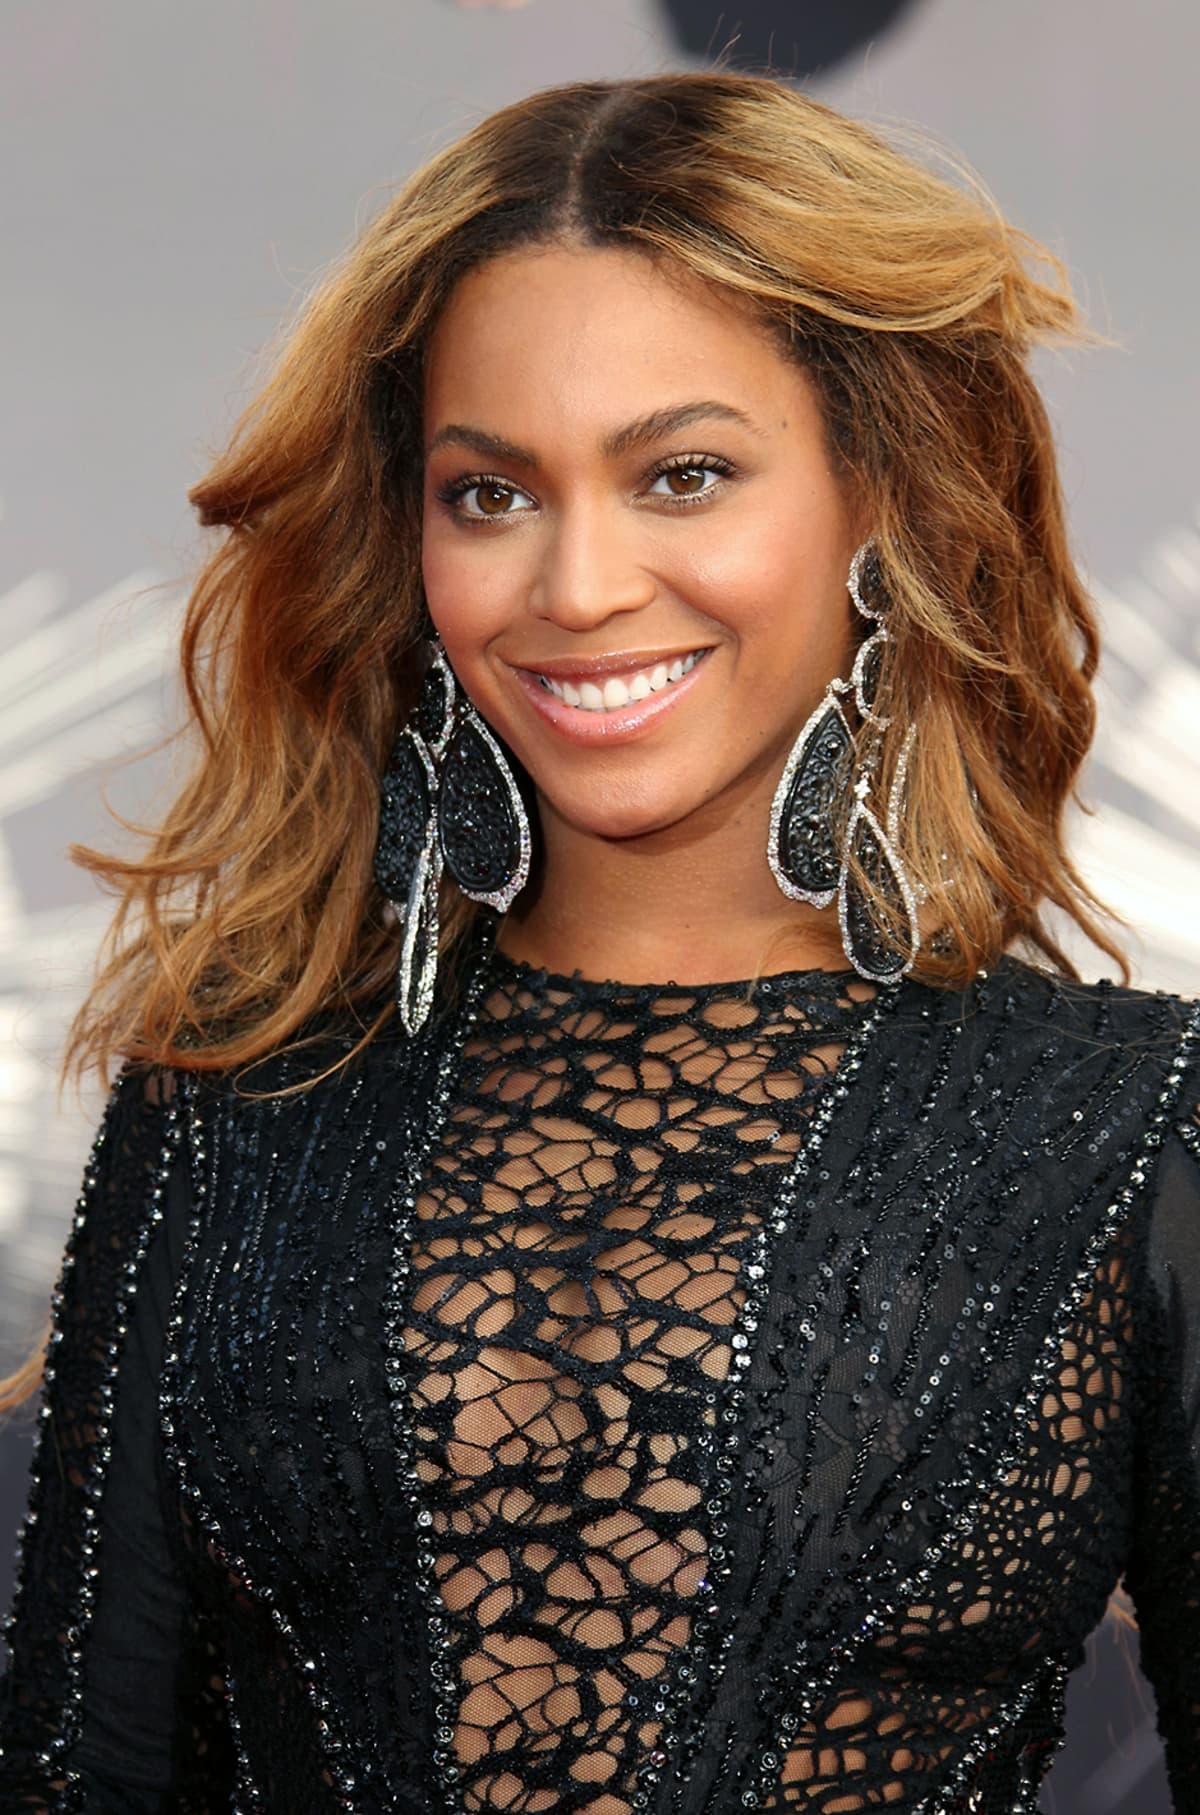 Yhdysvaltalainen näyttelijä Beyoncé.